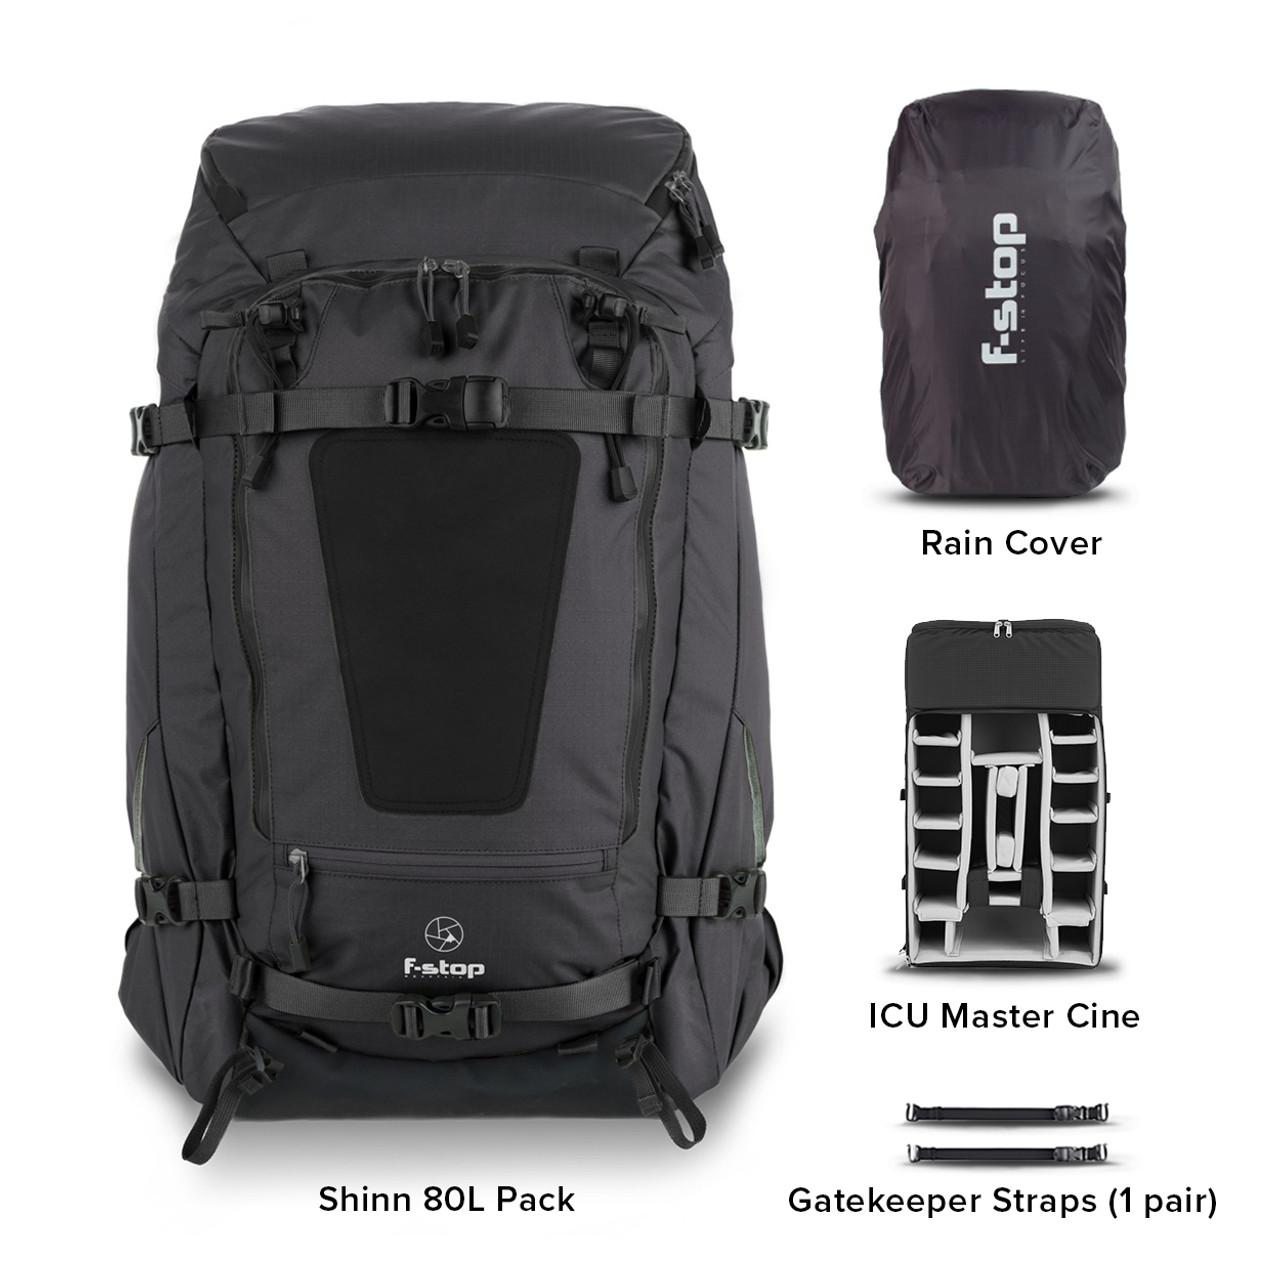 Shinn 80L Camera Backpack Essentials Bundle